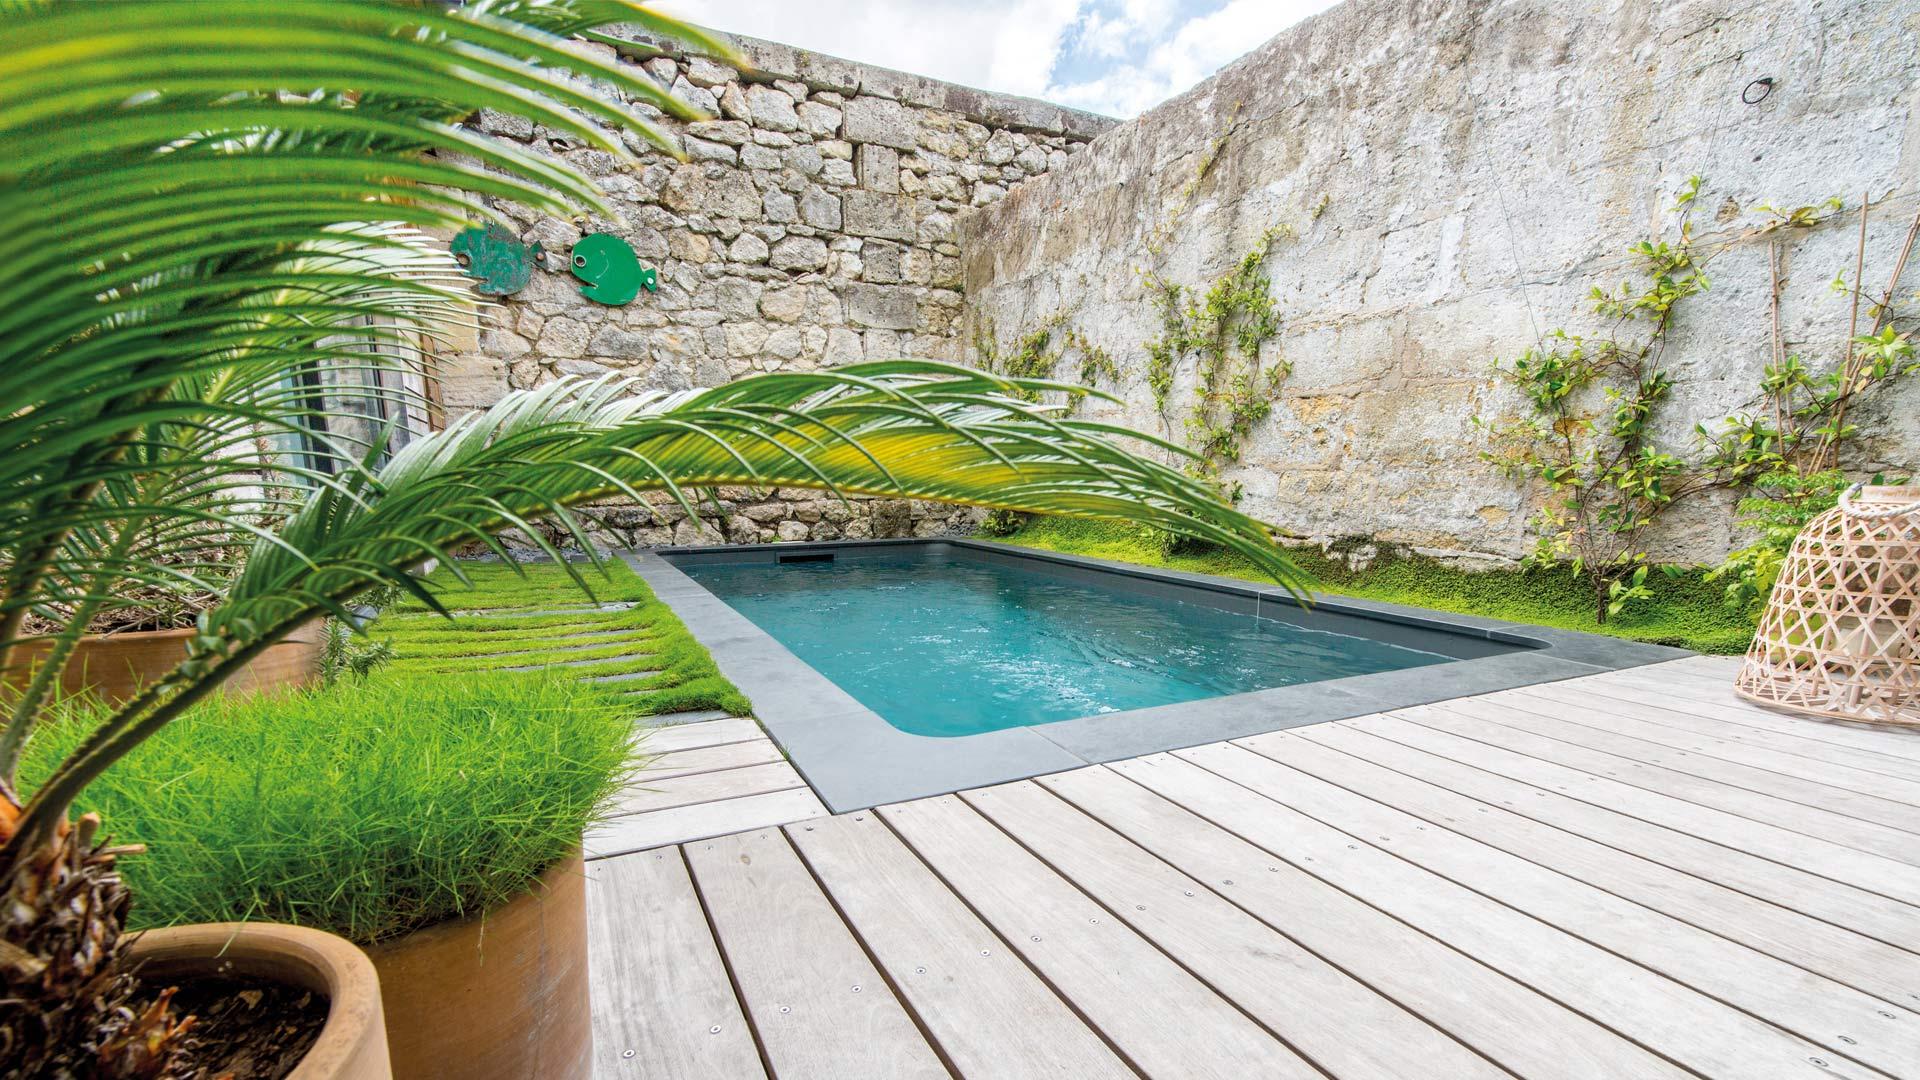 Aquitaine Piscines & Finitions - piscine haut de gamme Bordeaux Gironde